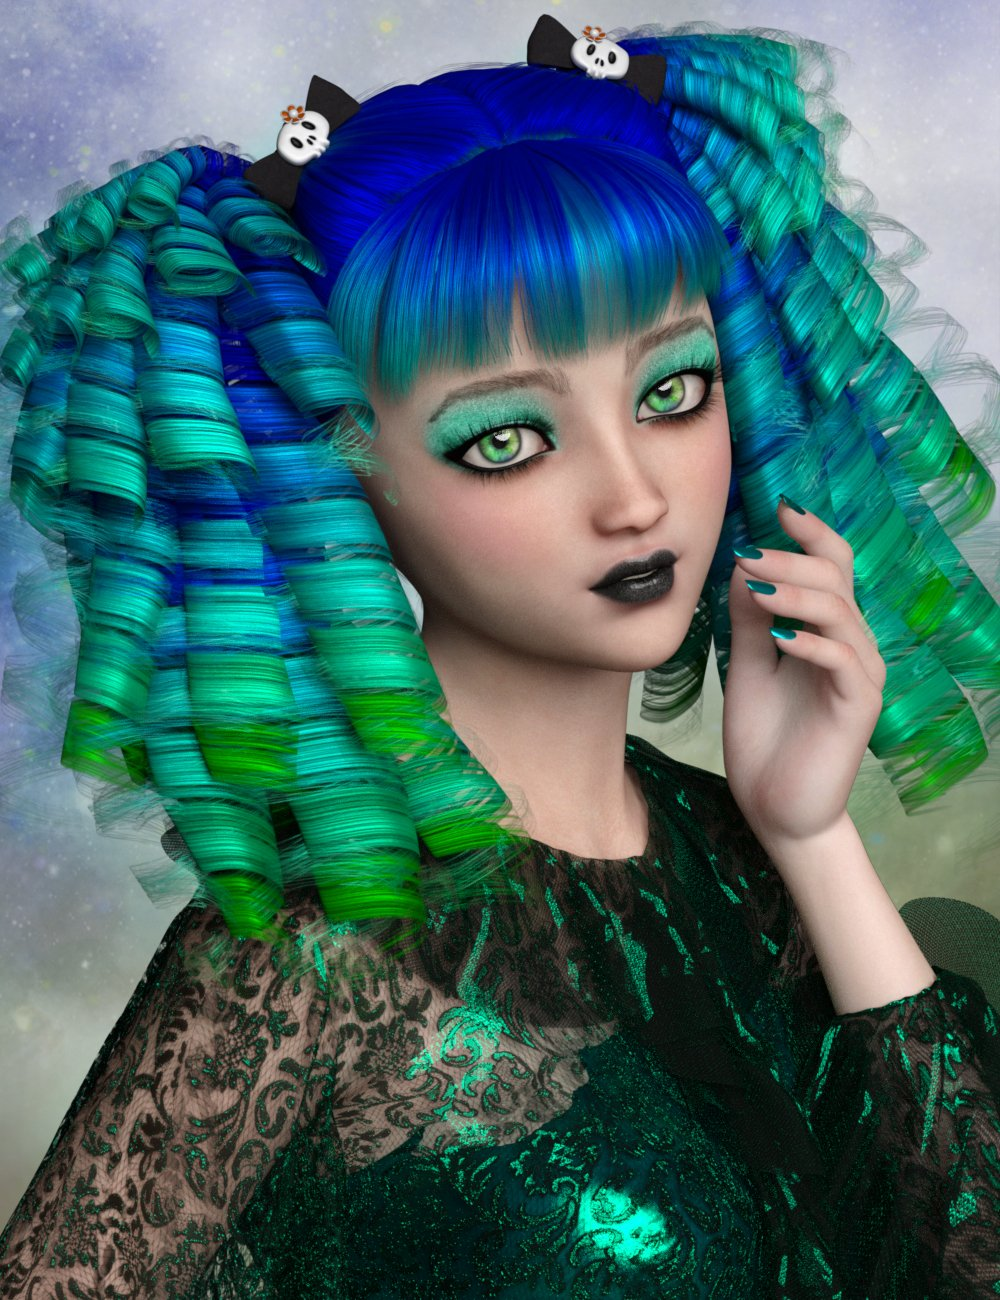 Rue for Kanade 8 by: Dark-ElfDisparateDreamer, 3D Models by Daz 3D